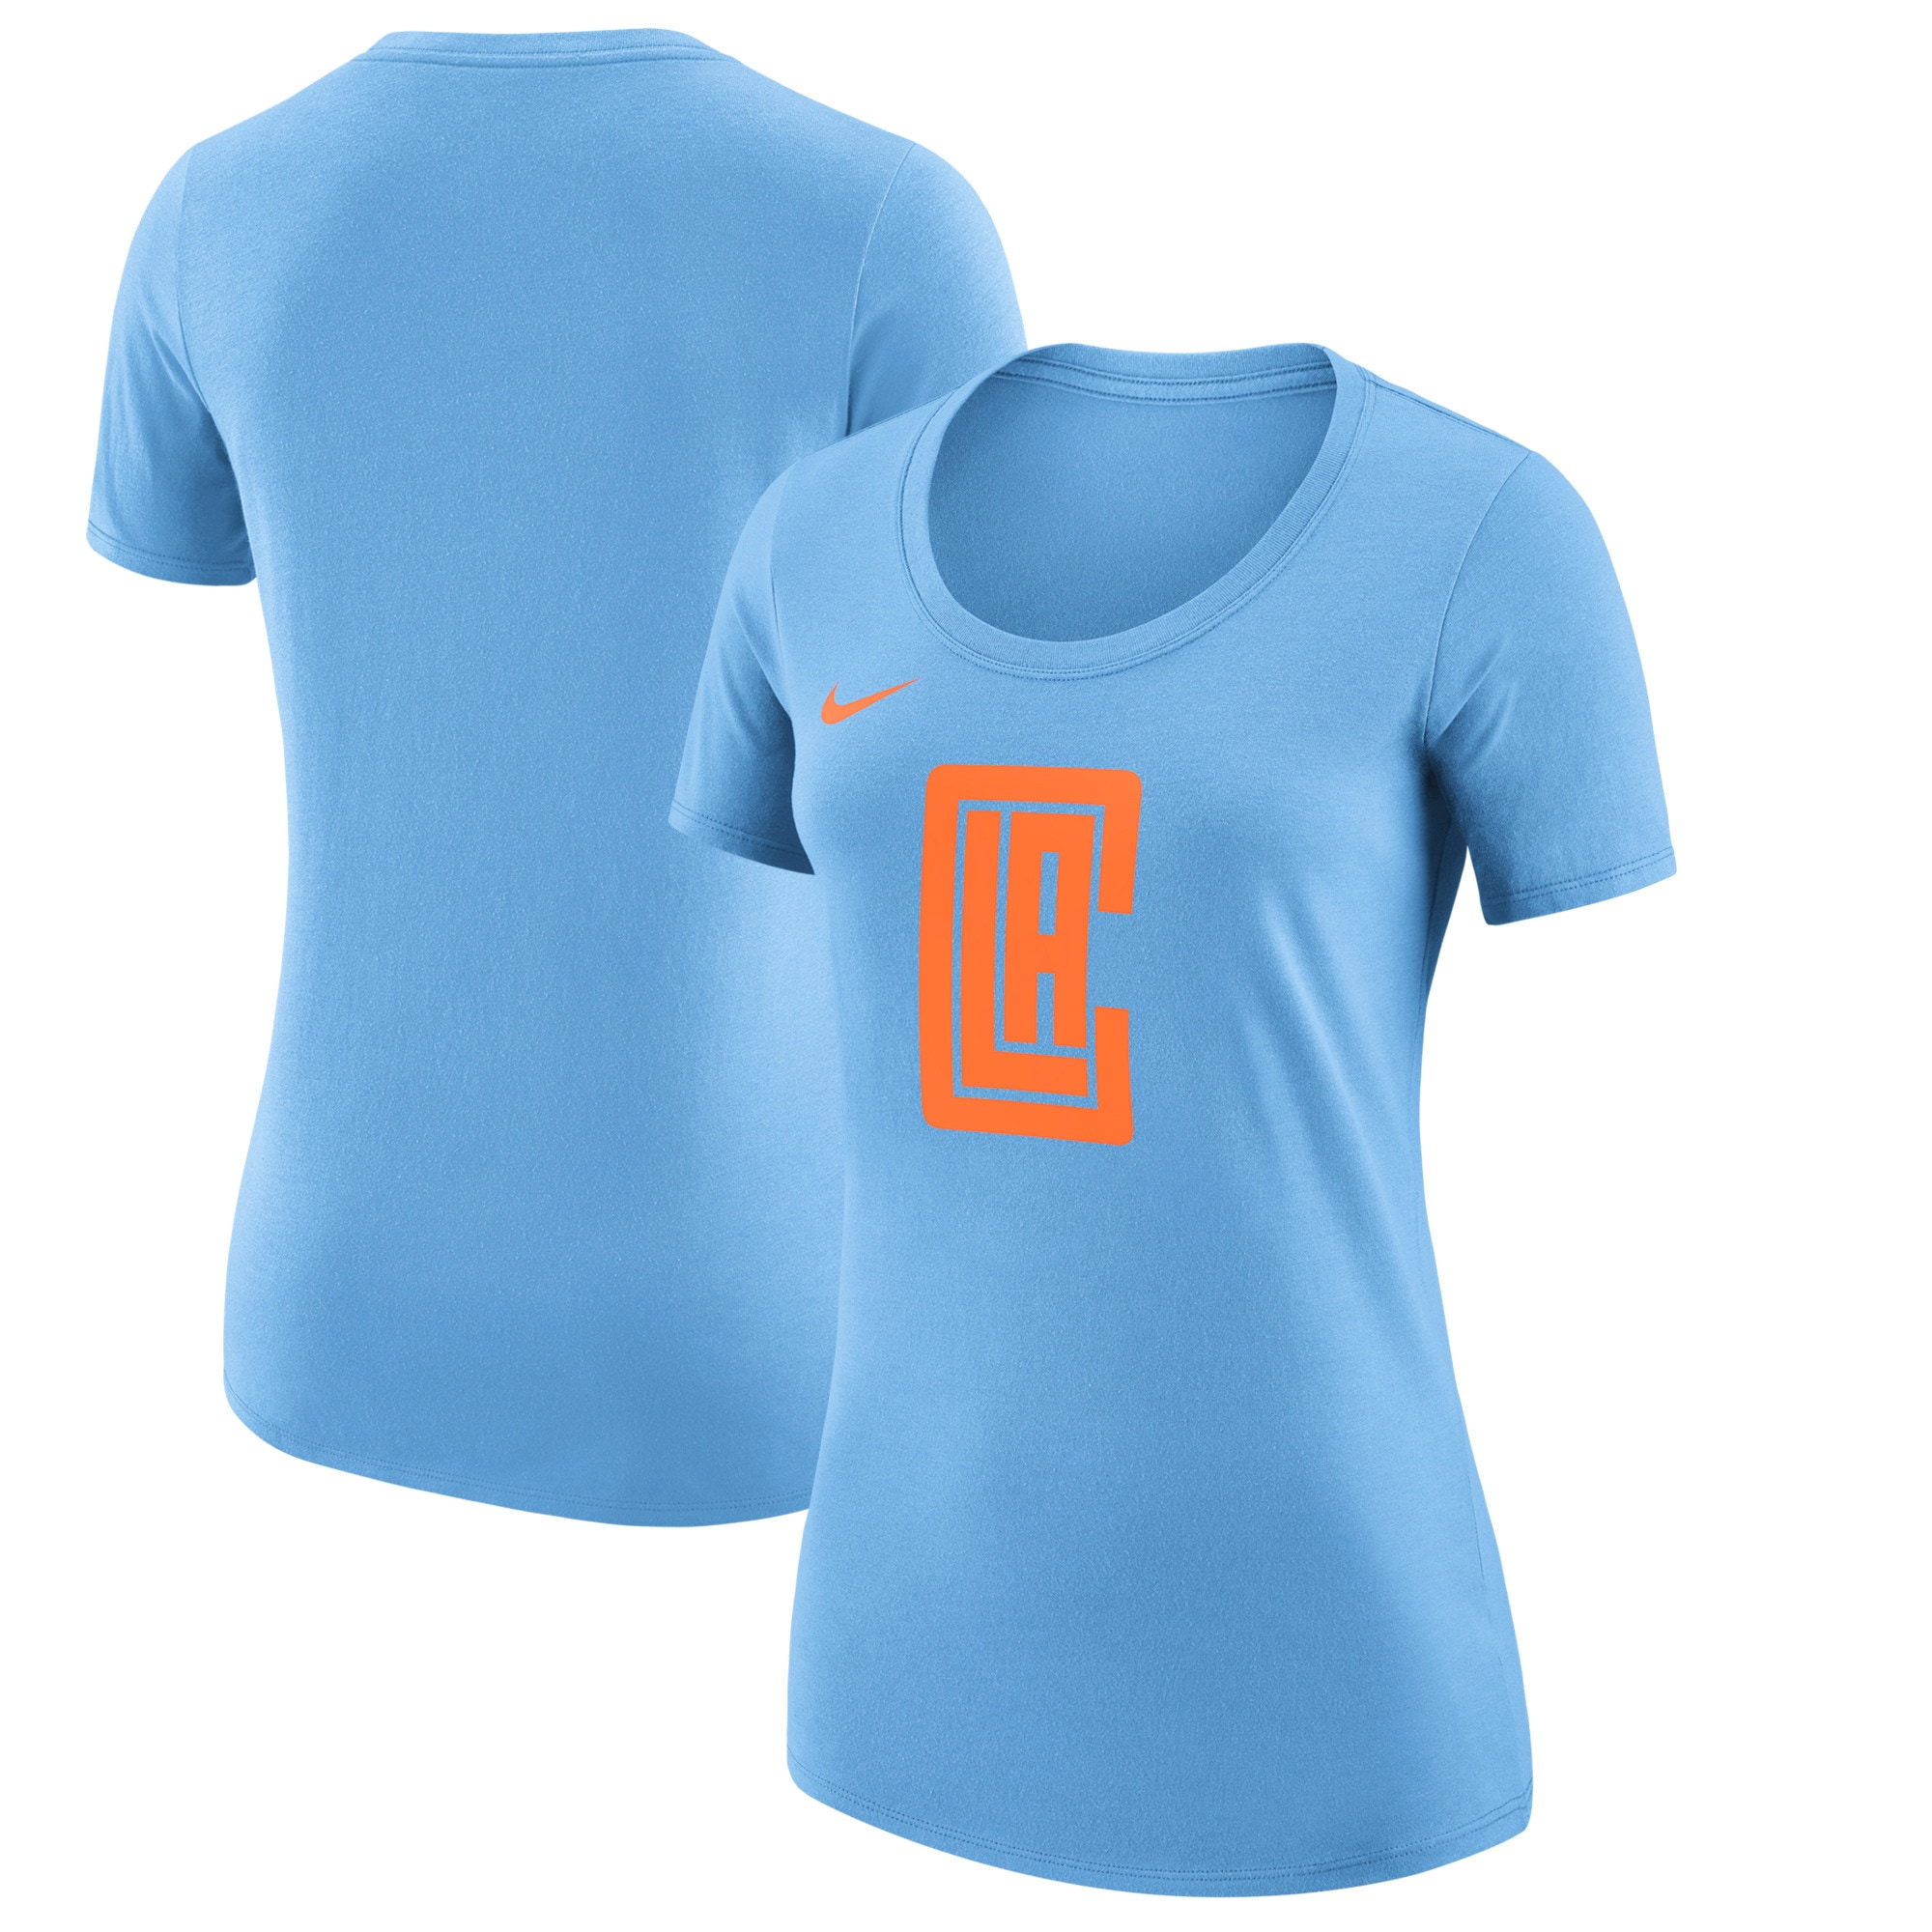 LA Clippers Nike Women's City Edition Essential Team Performance T-Shirt - Blue